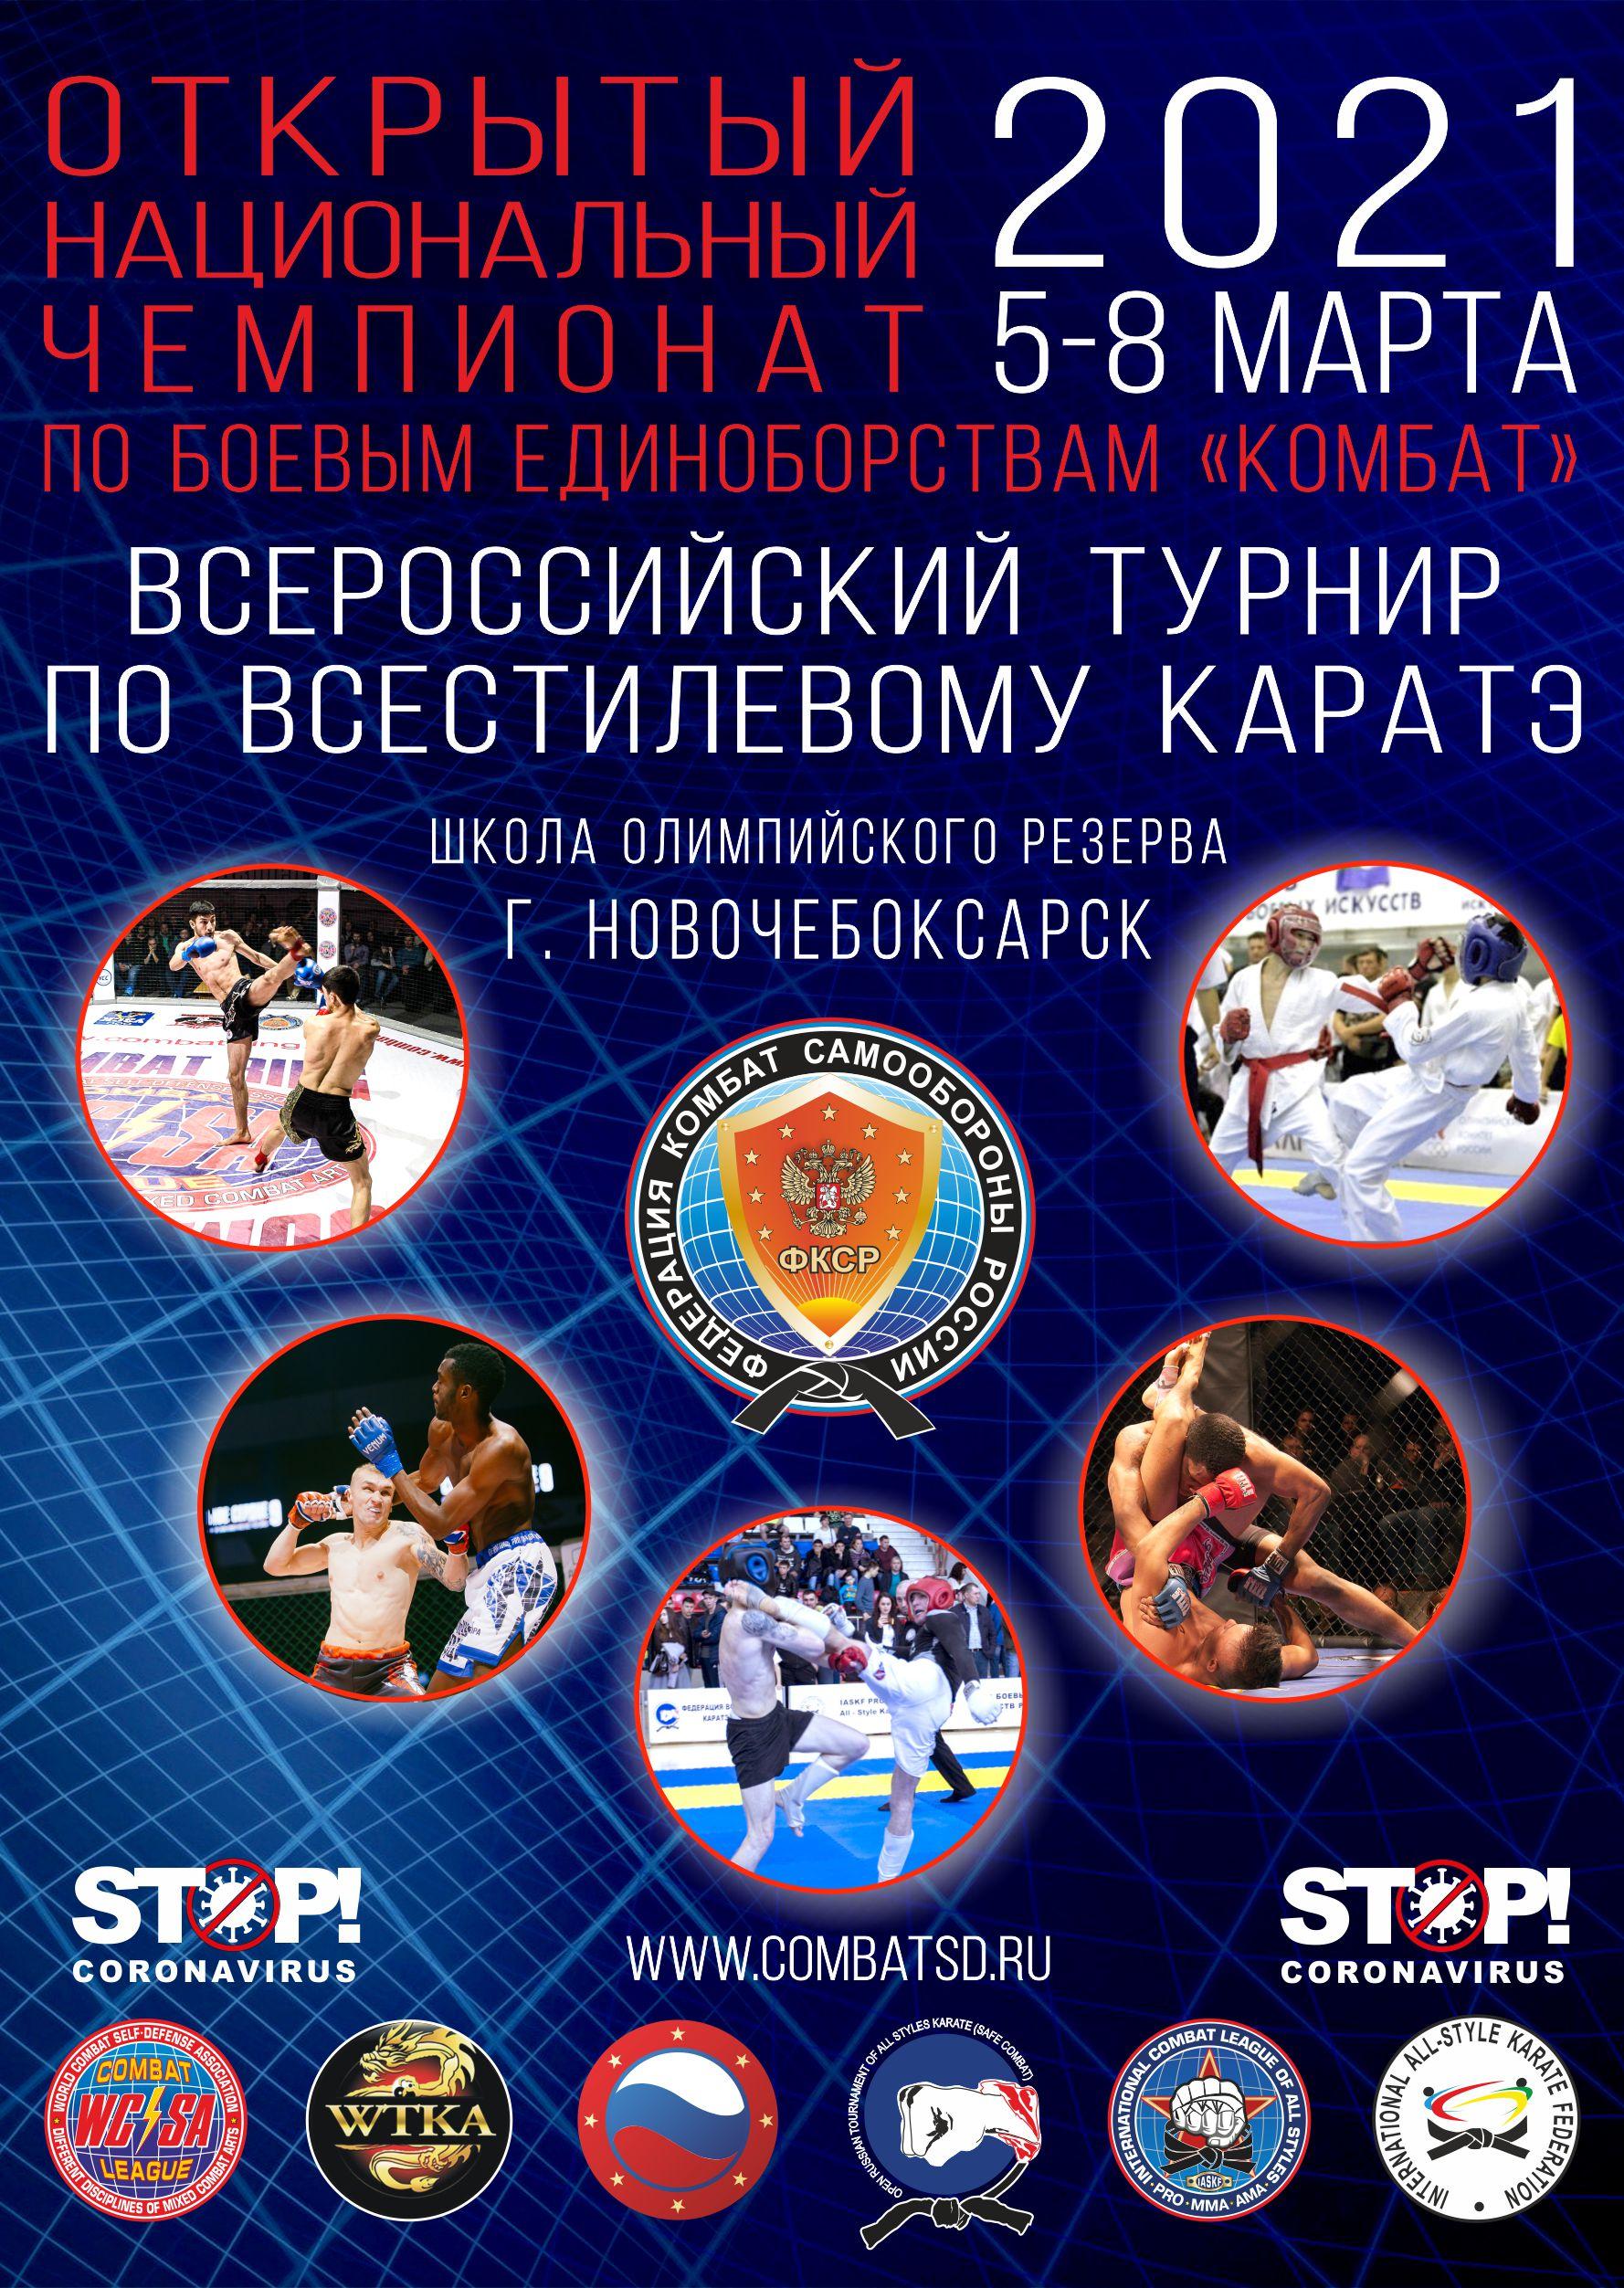 http://combatsd.ru/images/upload/март%20ФКСР.jpg